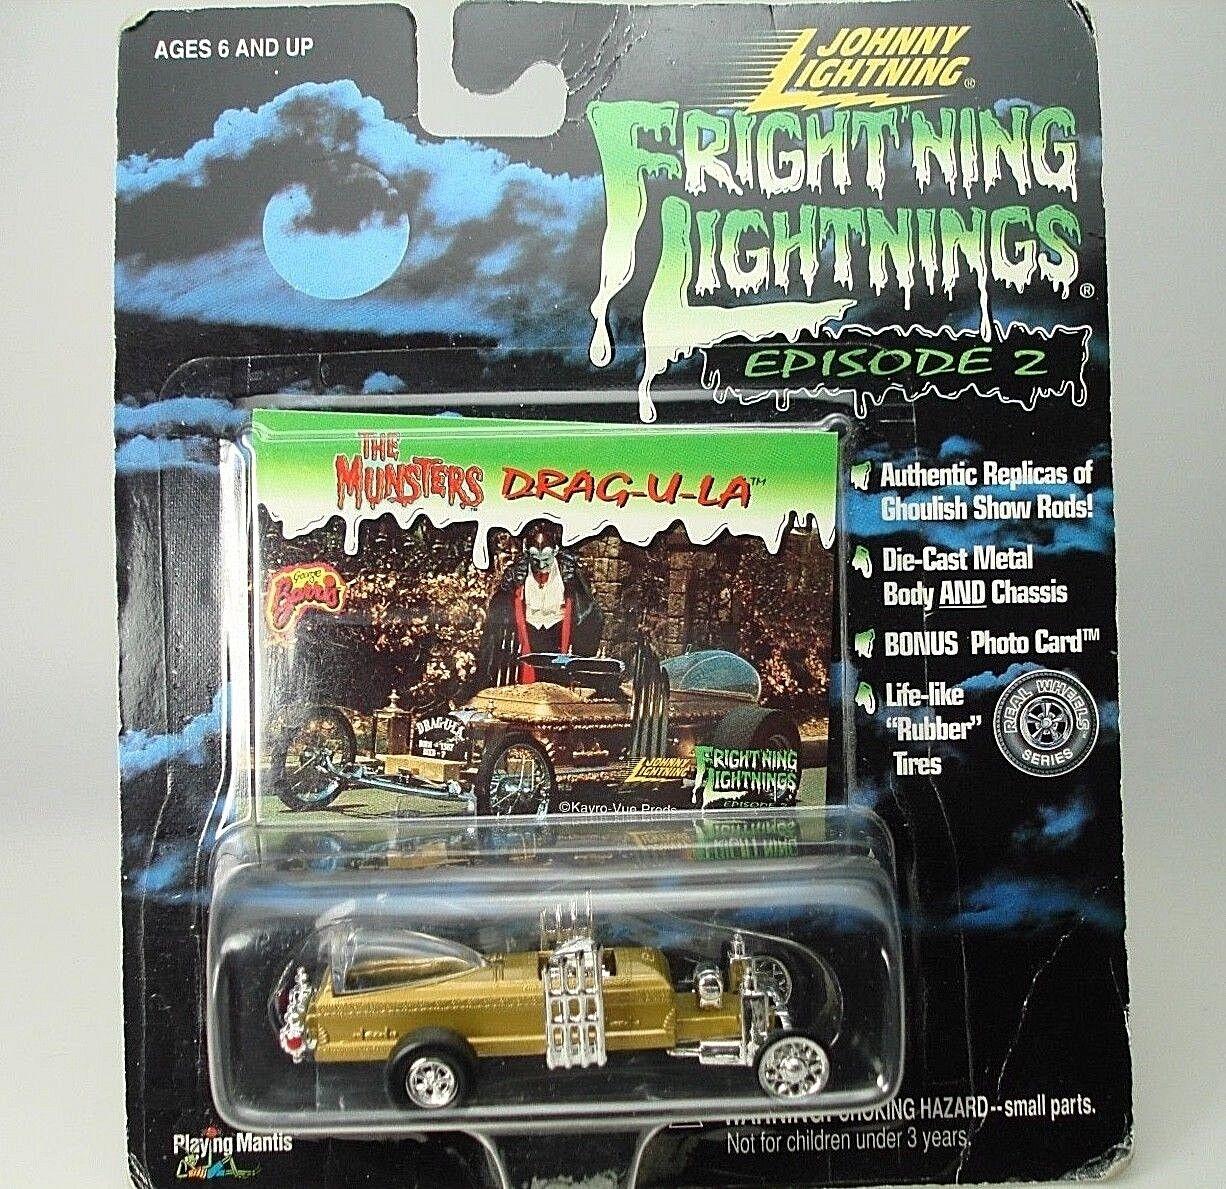 Johnny Lightning Lightning Lightning  Frightning Lightning Munsters Drag-u-la Photo Card dbab28